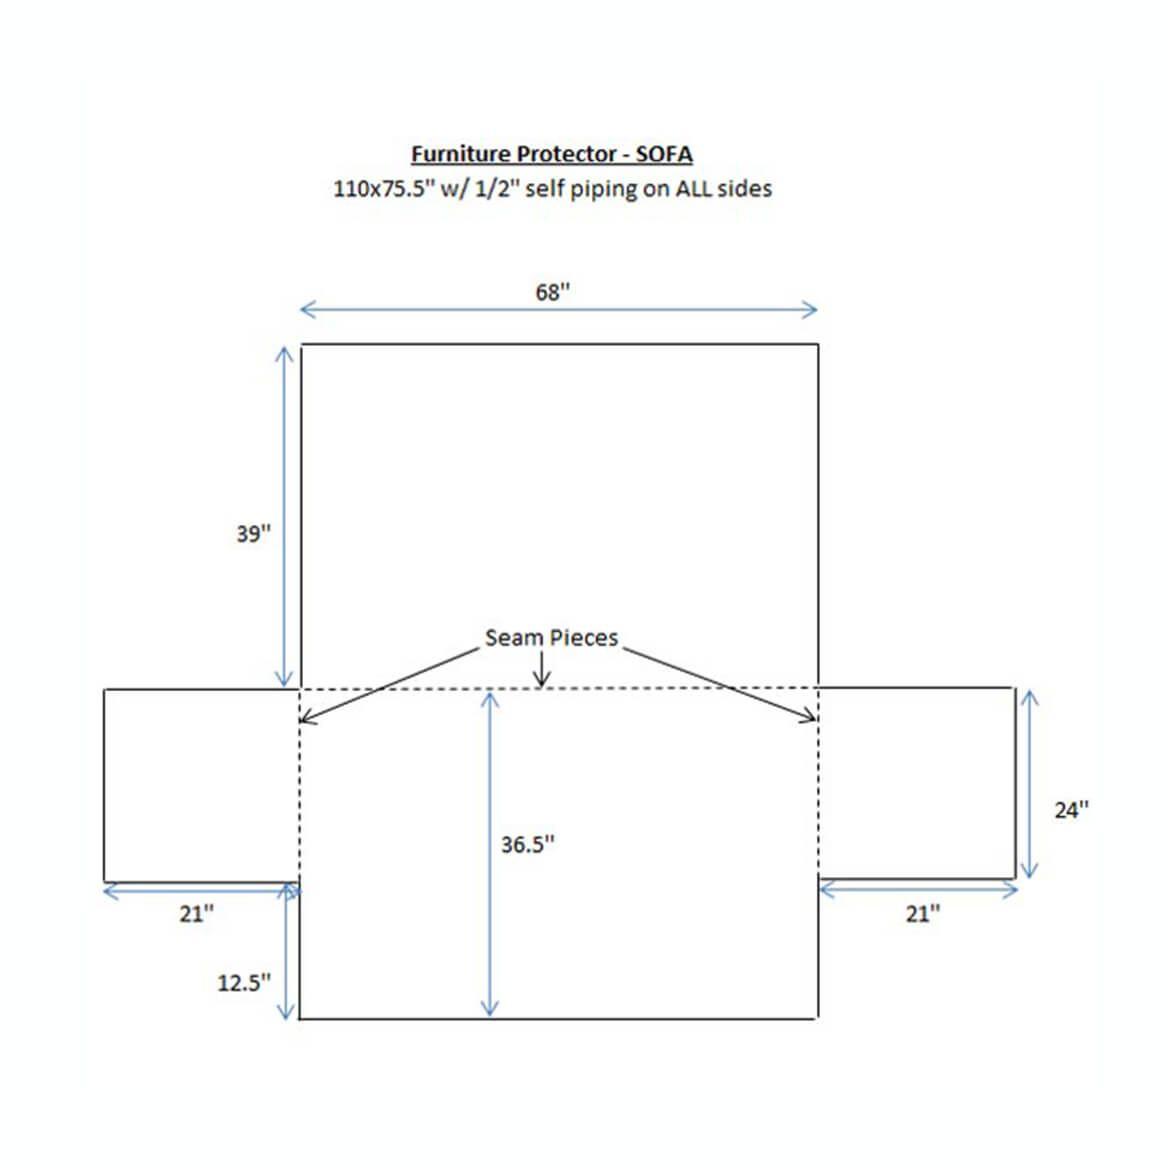 Puff Sofa Furniture Protector-349611